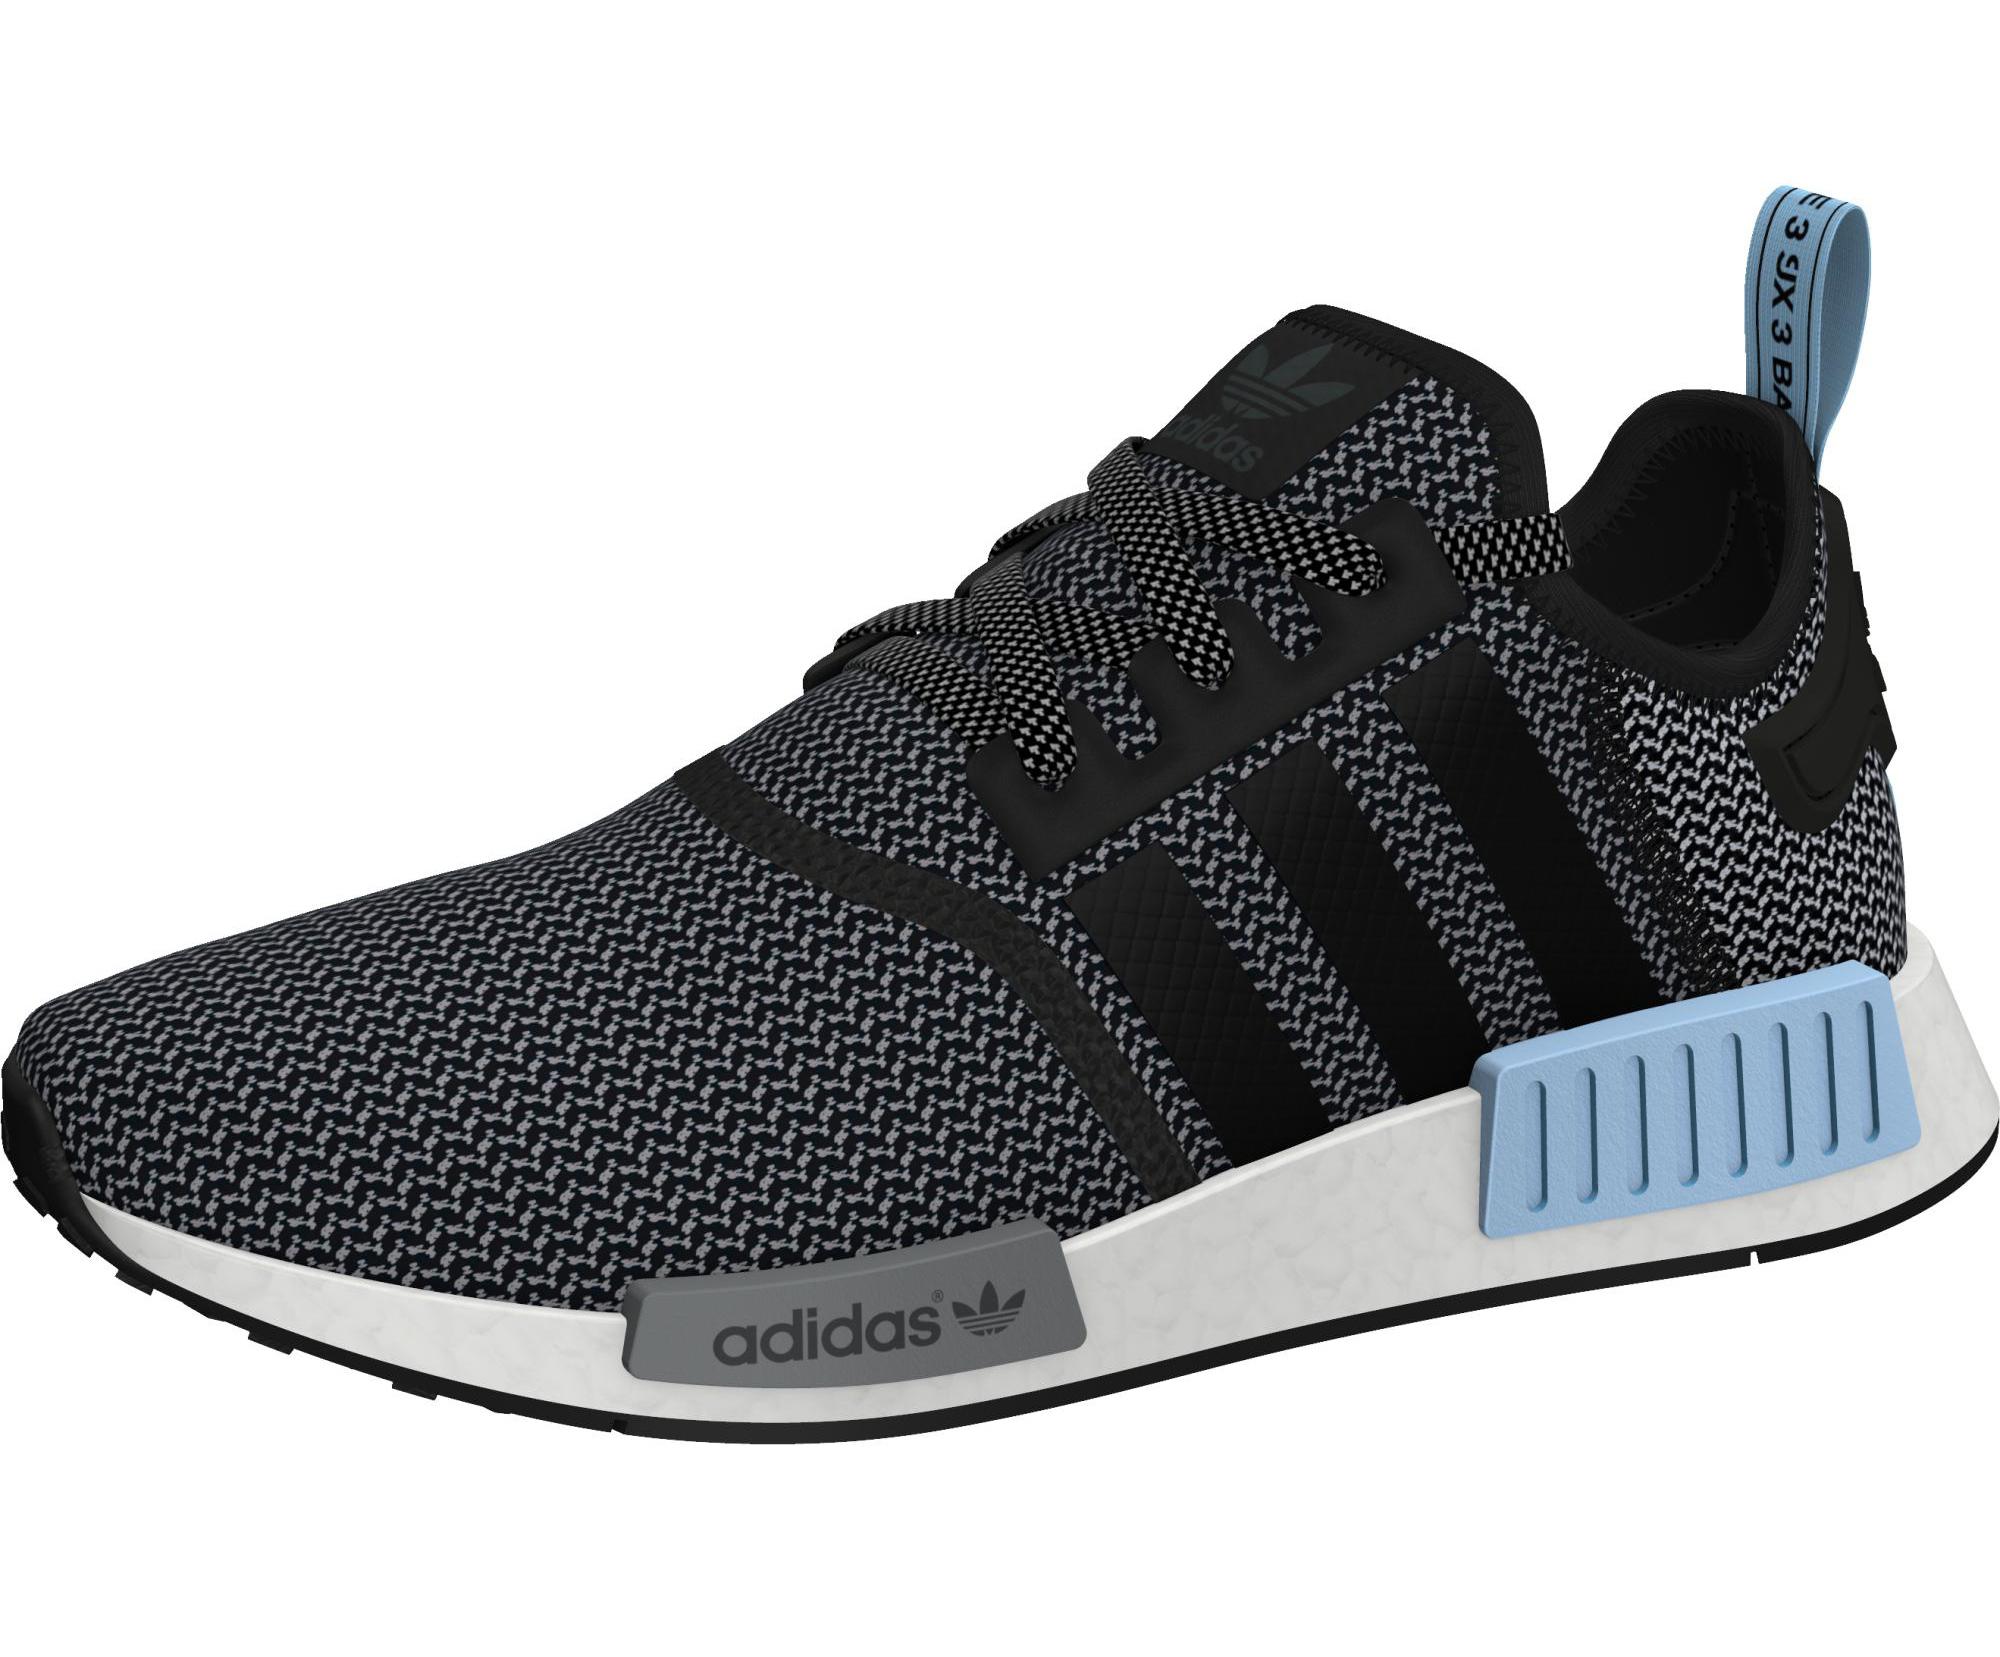 online store 53a14 e6936 Chaussures Adidas Nmd Homme En Ligne Tea308